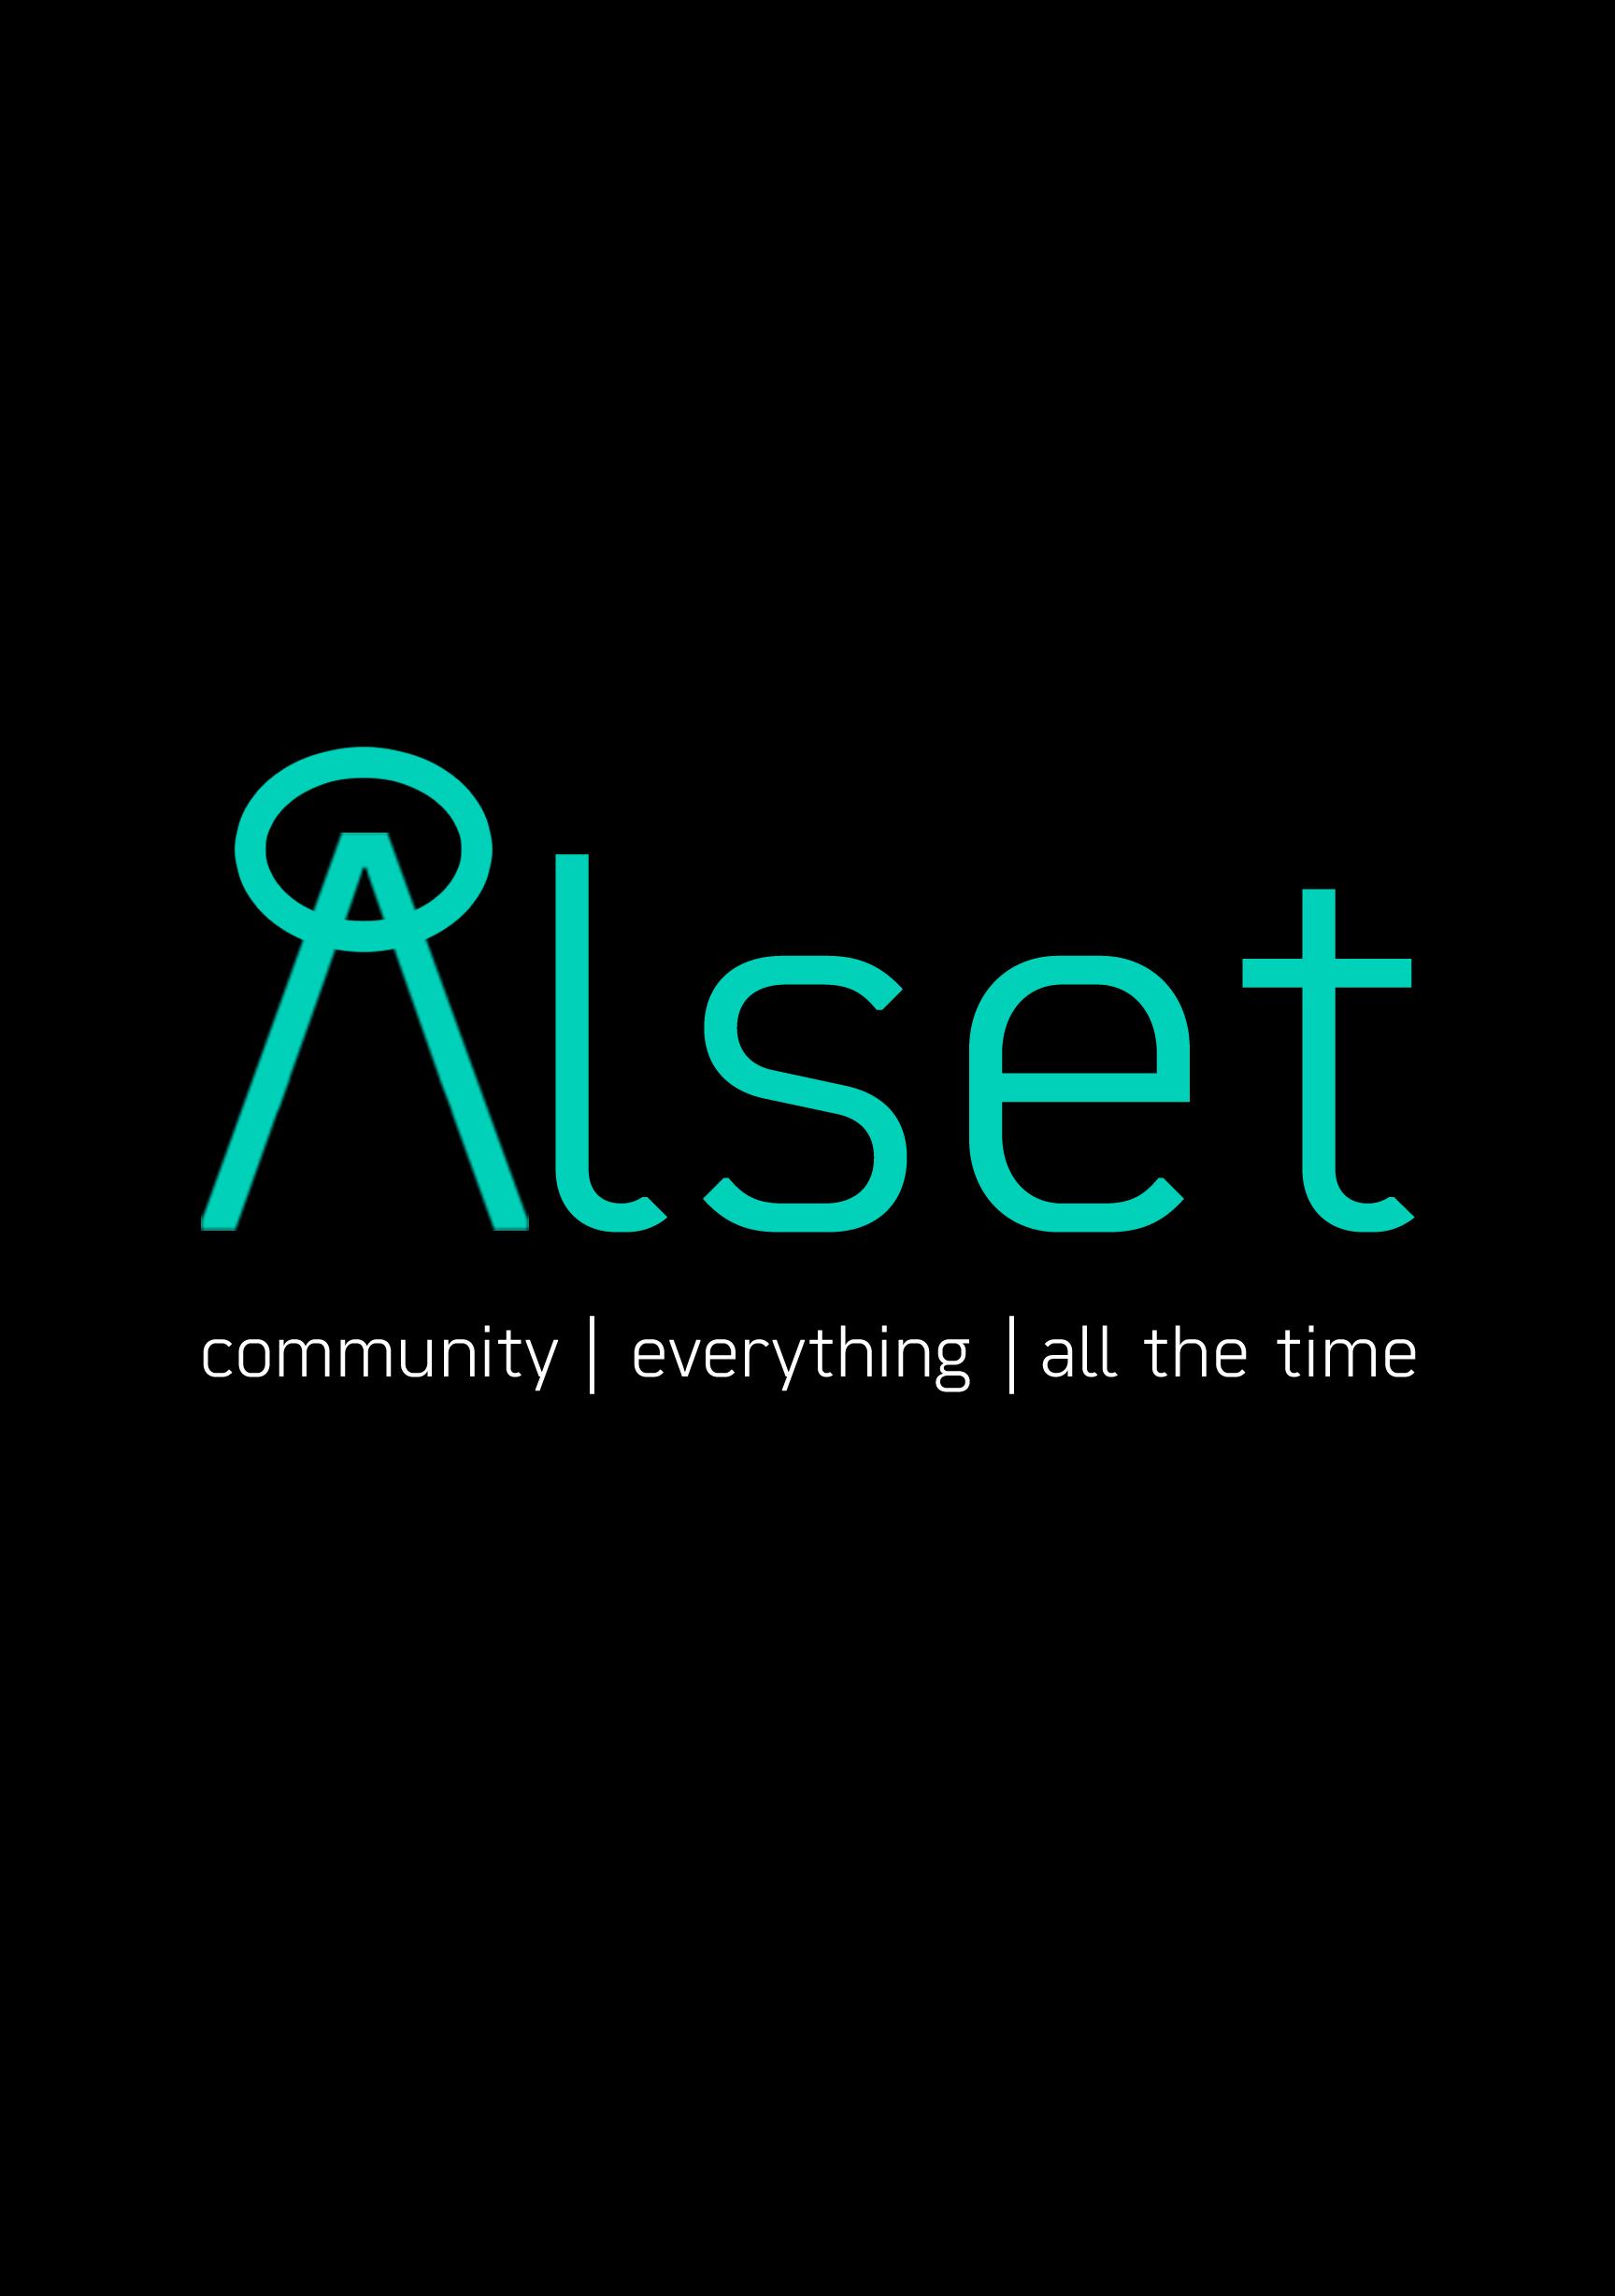 Alset Dark logo